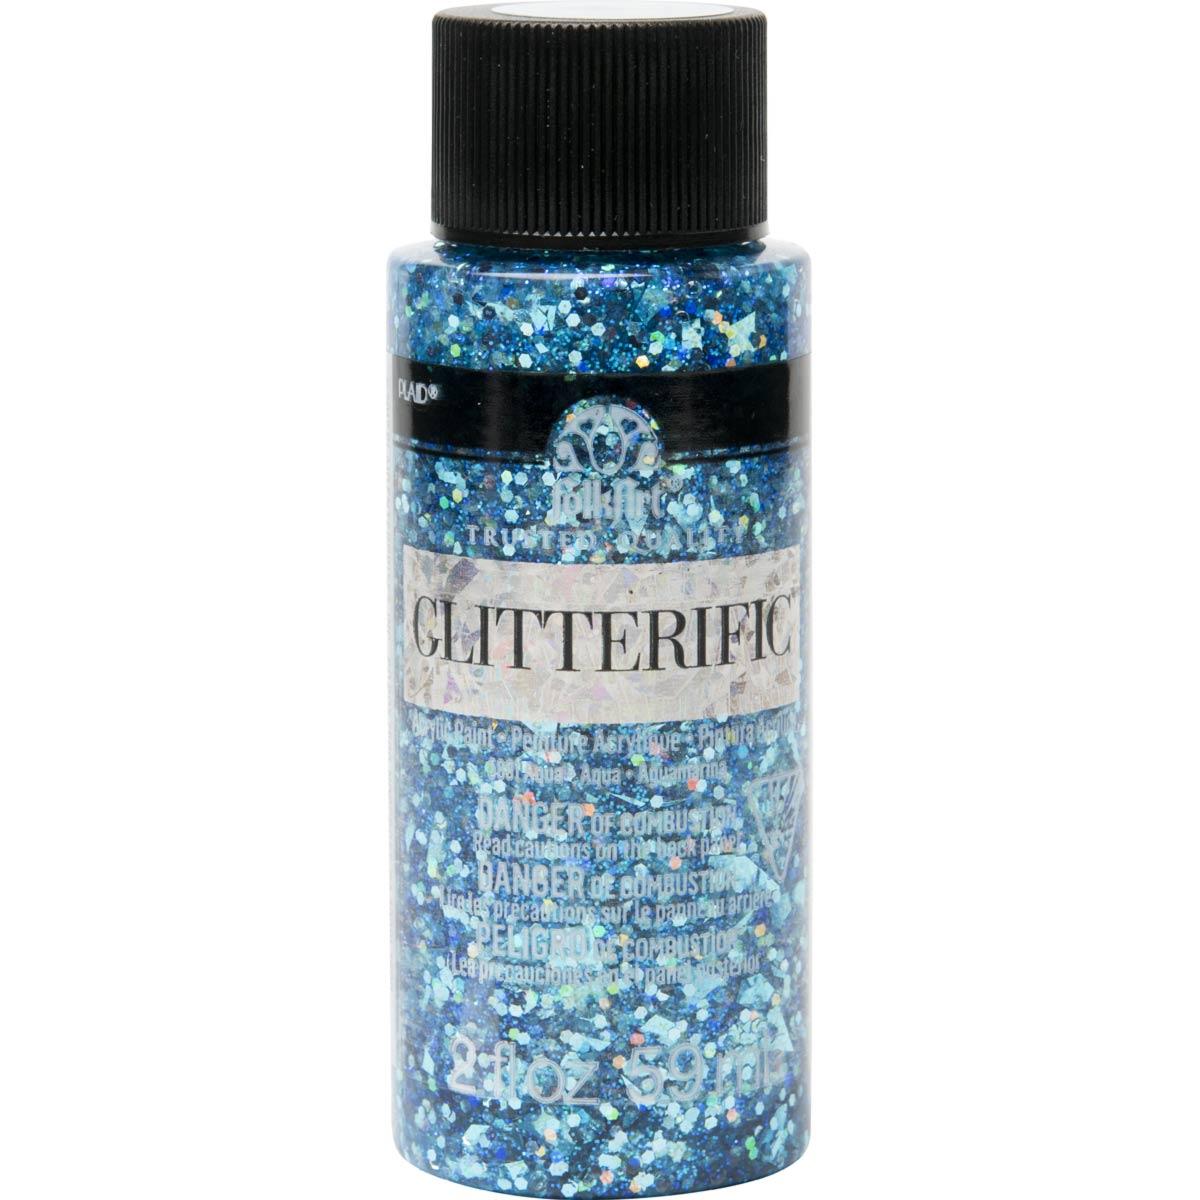 FolkArt ® Glitterific™ Acrylic Paint - Aqua, 2 oz.